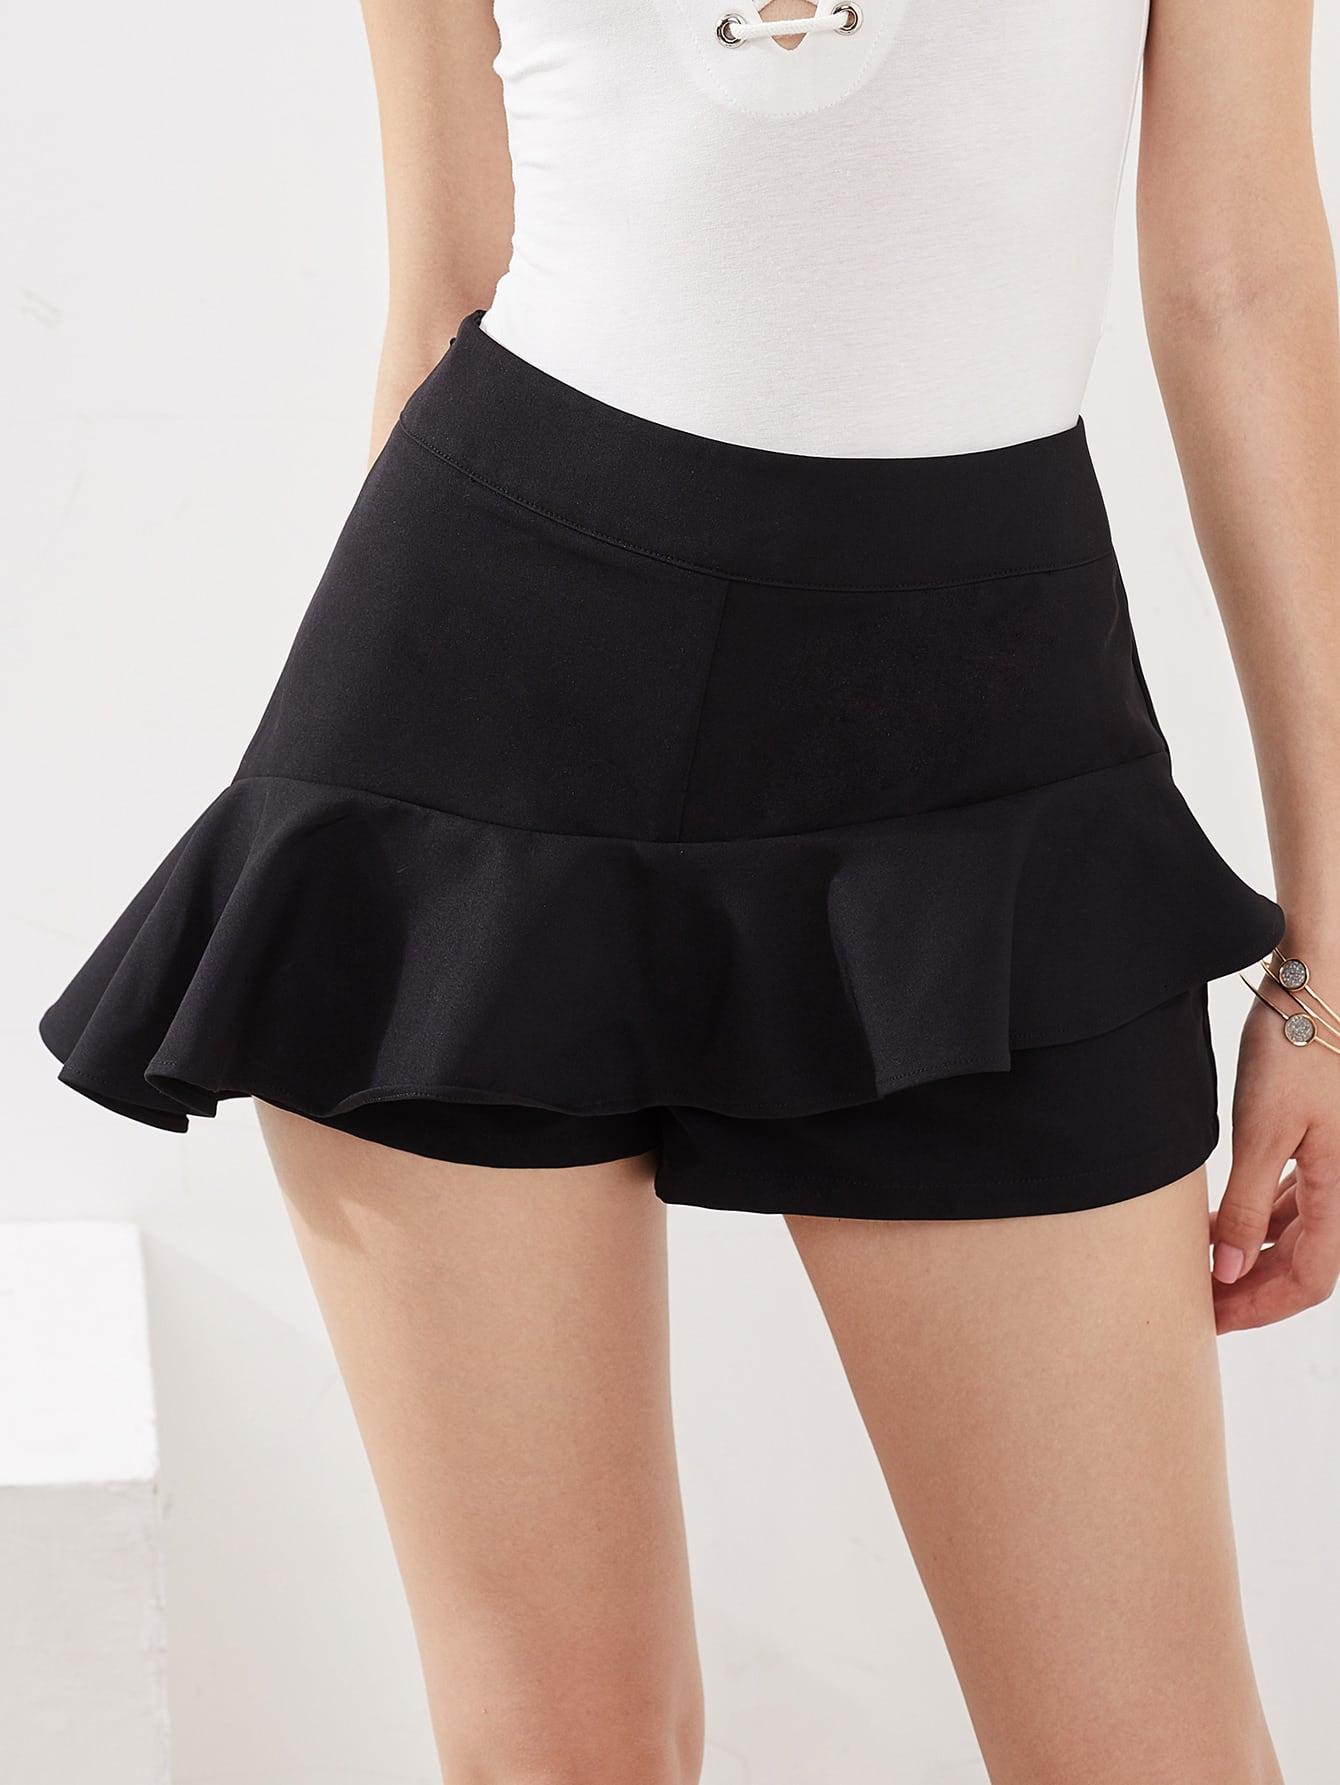 Zip Side Asymmetric Ruffle Skort shorts170606703